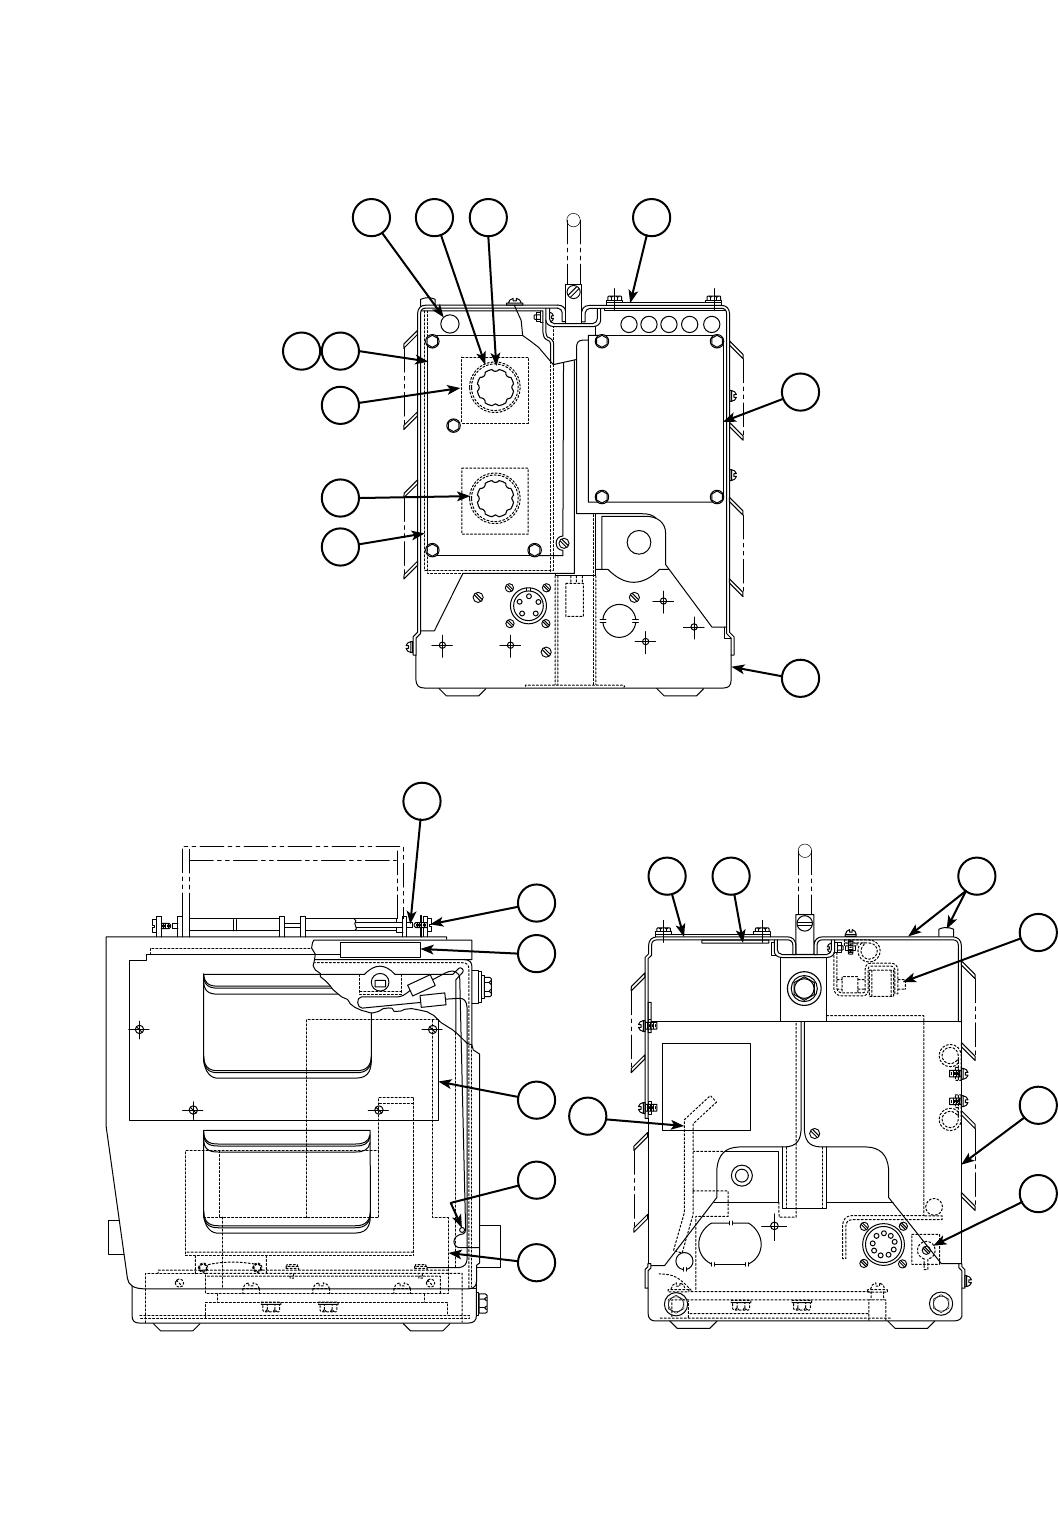 Ln 8 wire feed unit